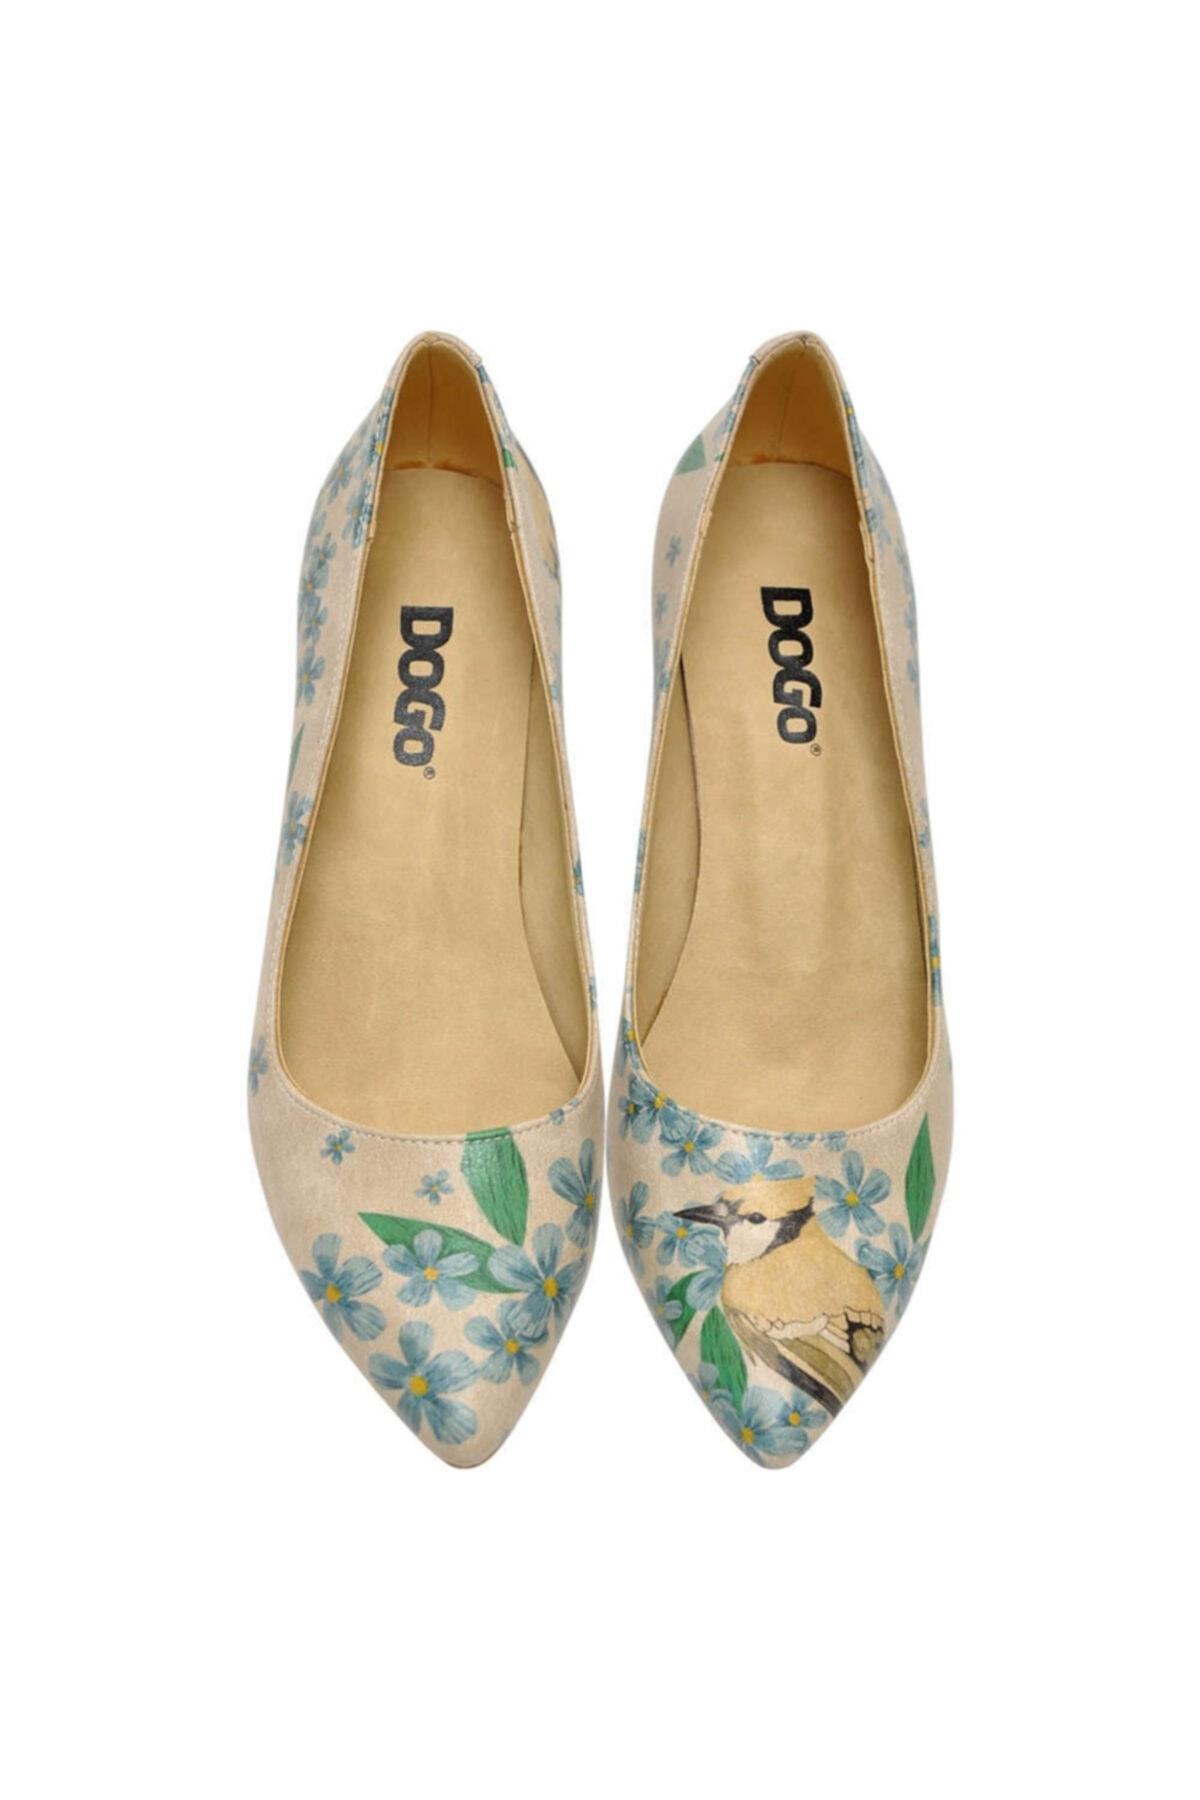 Dogo Nature Kadın Topuklu Ayakkabı 1